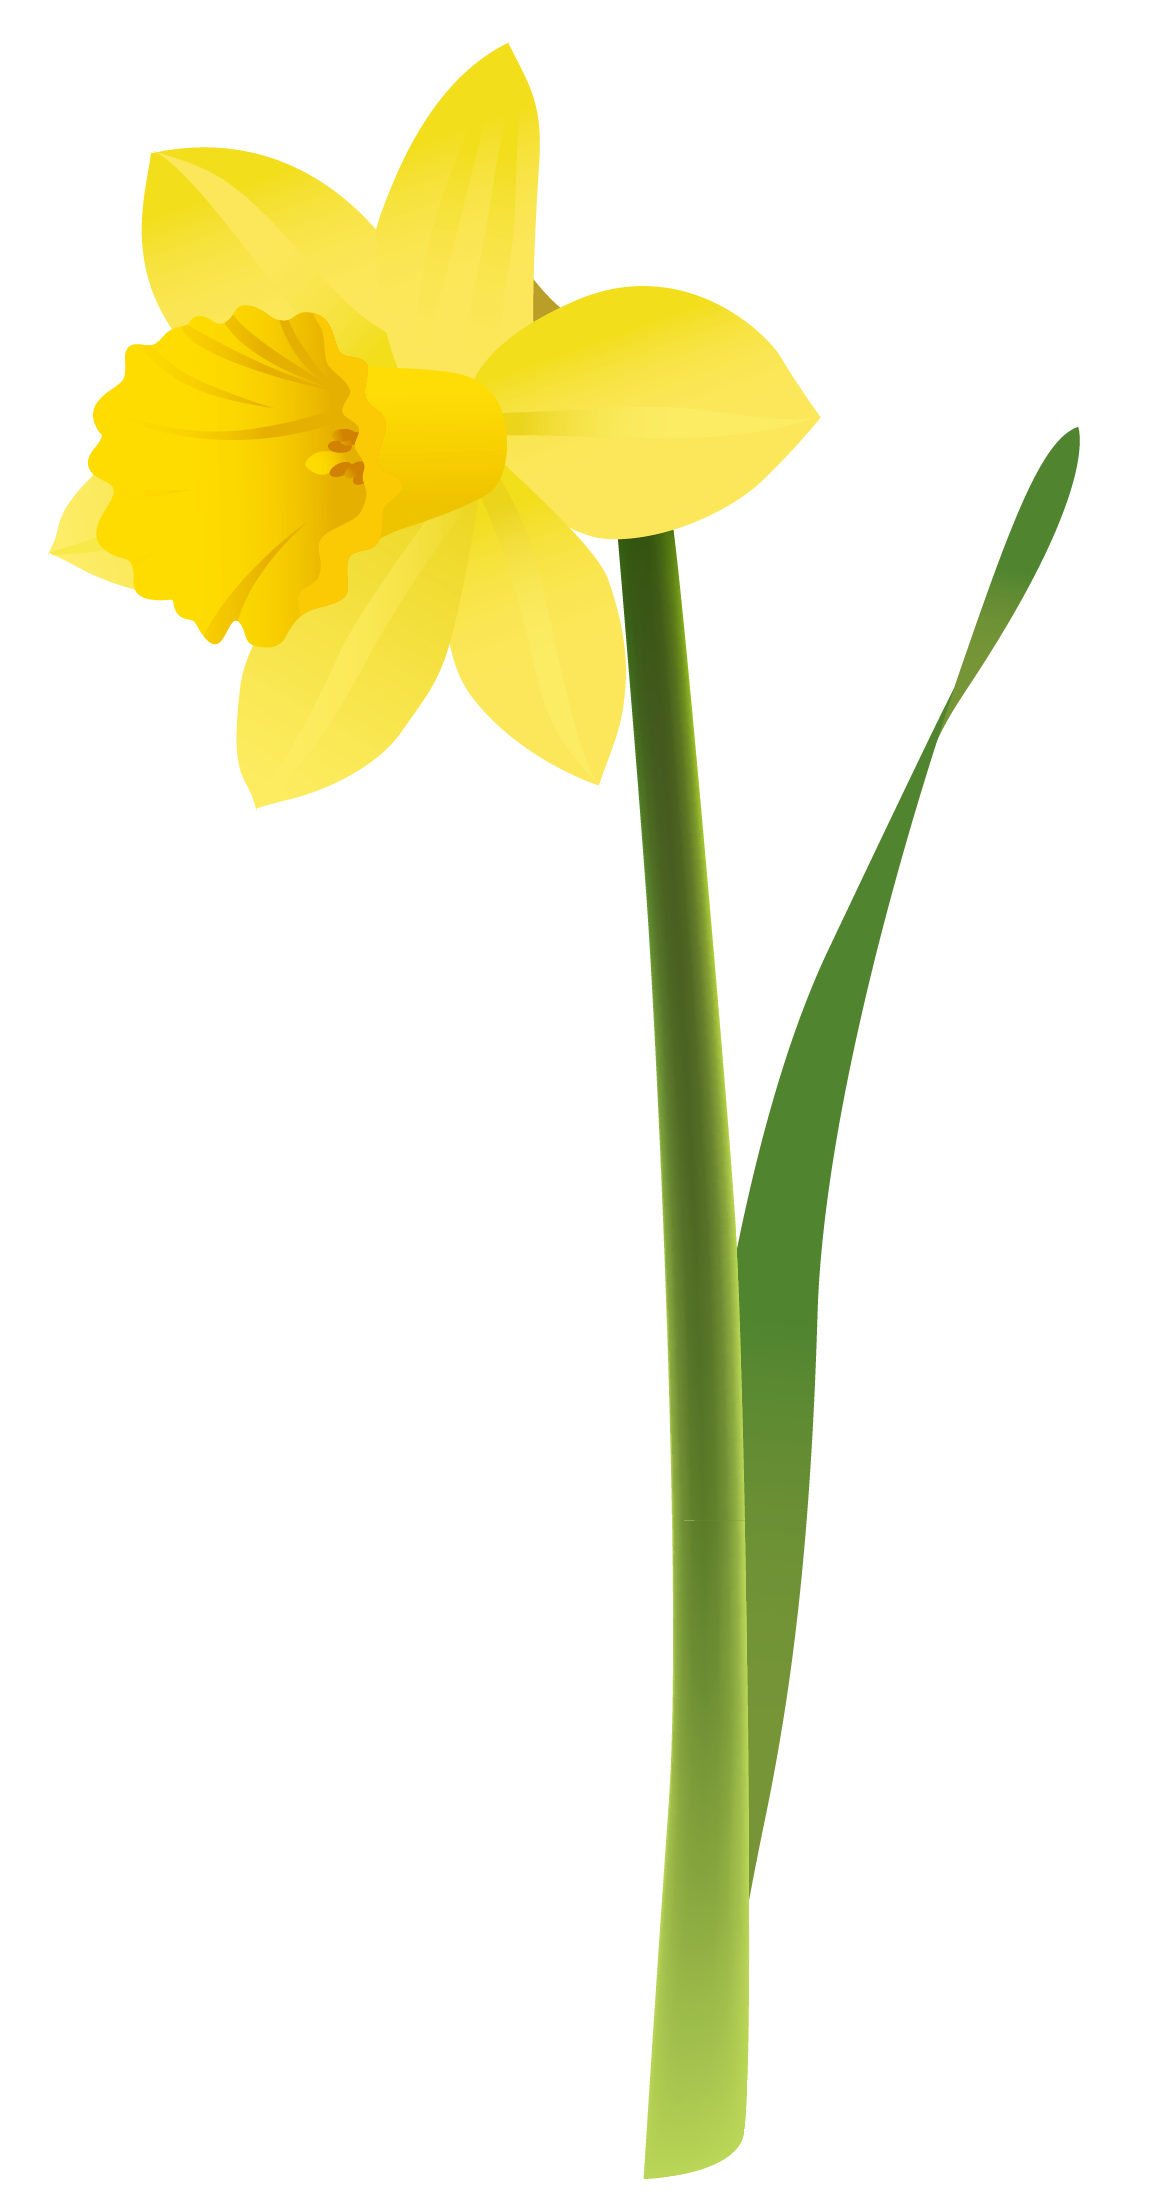 Daffodil Clipart.